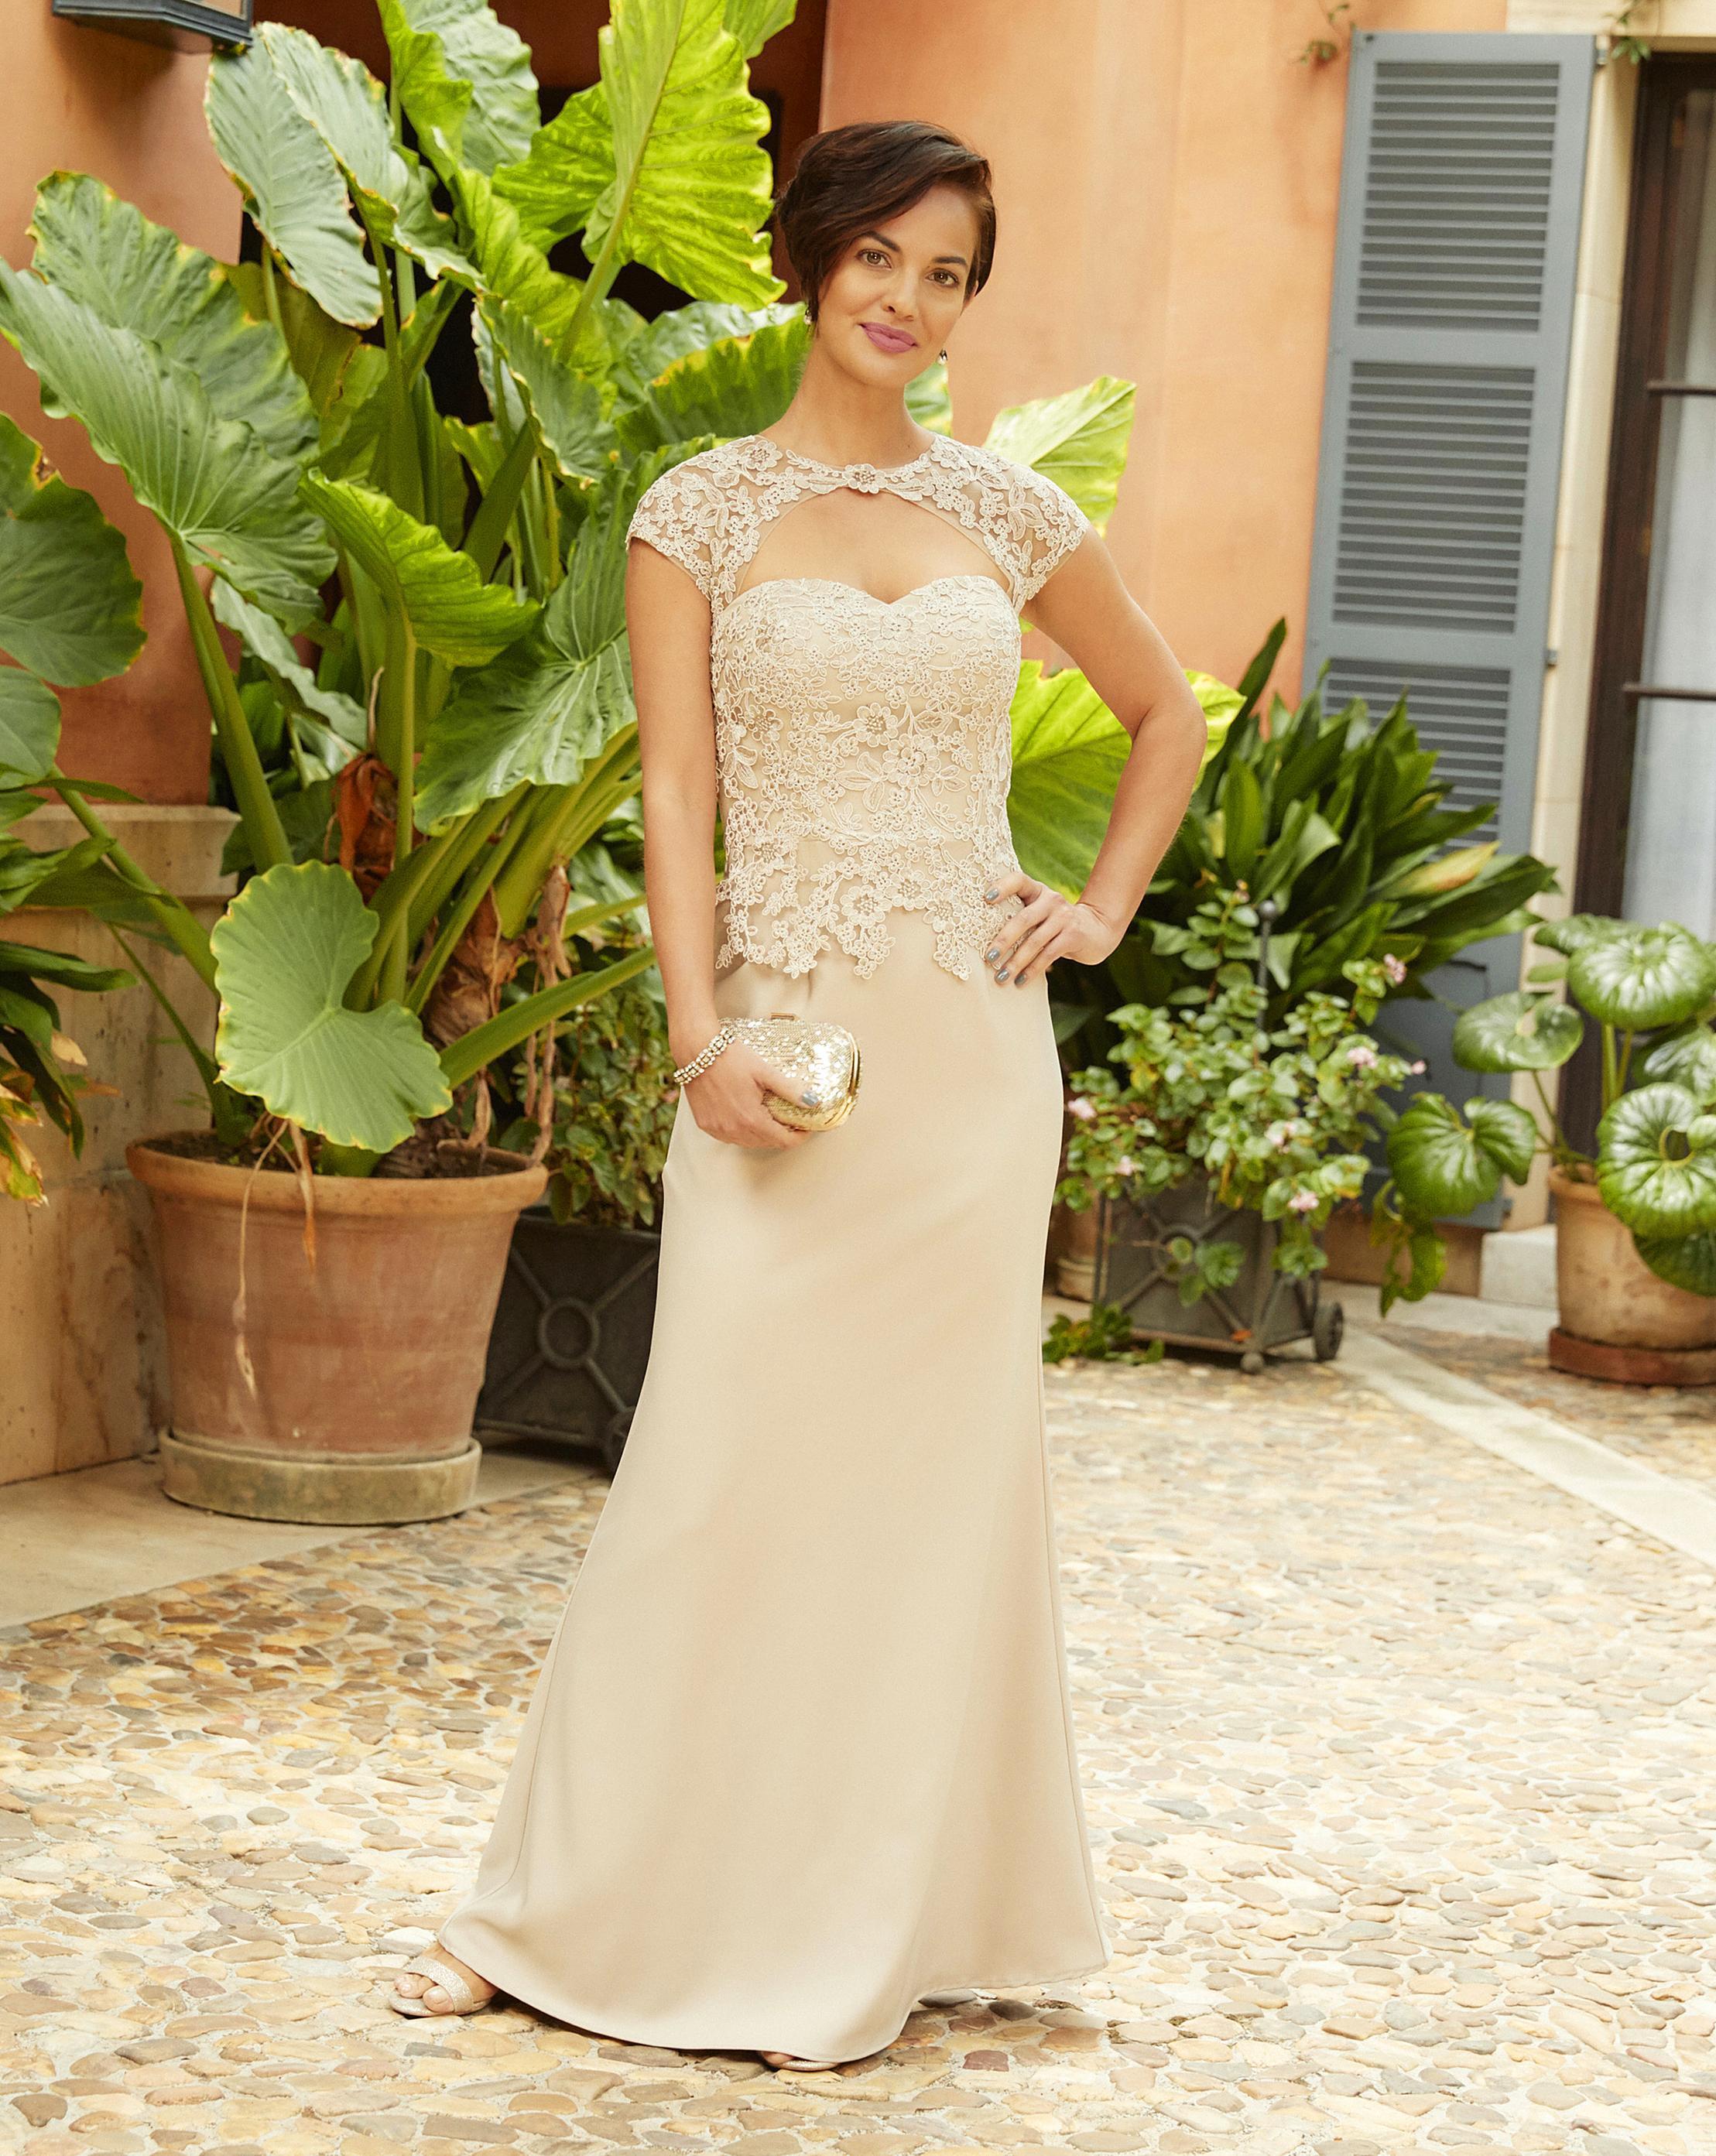 baad4de9357 Lyst - Simply Be Joanna Hope Lace Trim Maxi Dress